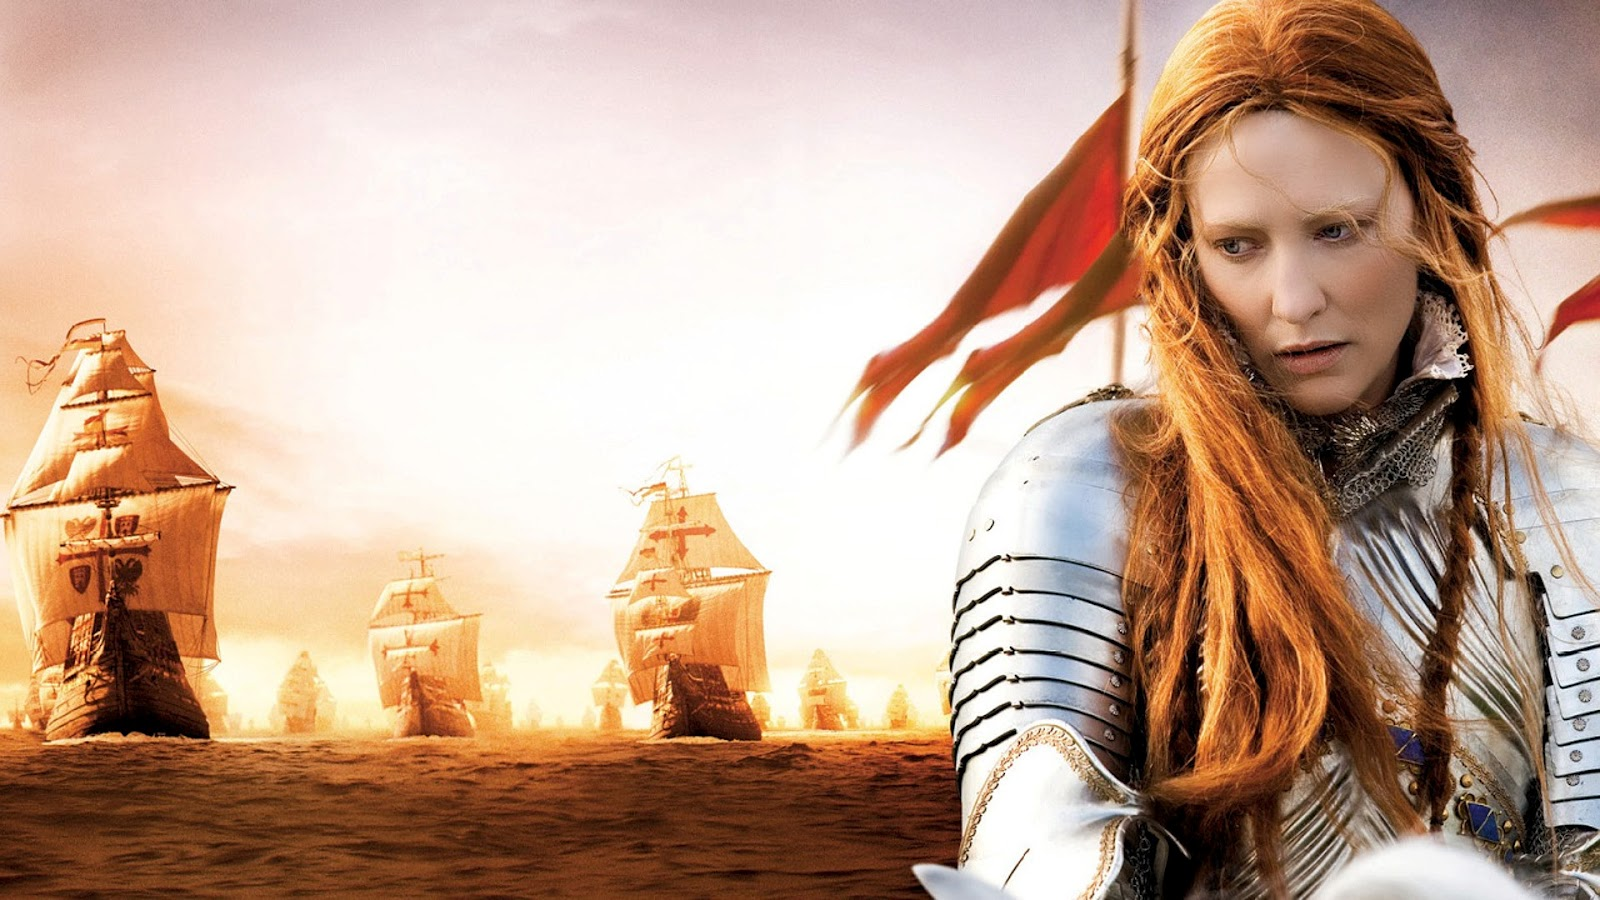 http://3.bp.blogspot.com/-XHMLx5l5fag/Ty_wf5WH2GI/AAAAAAAAA5M/Gh0qgIYNi_w/s1600/elizabeth-the-golden-age-original.jpg